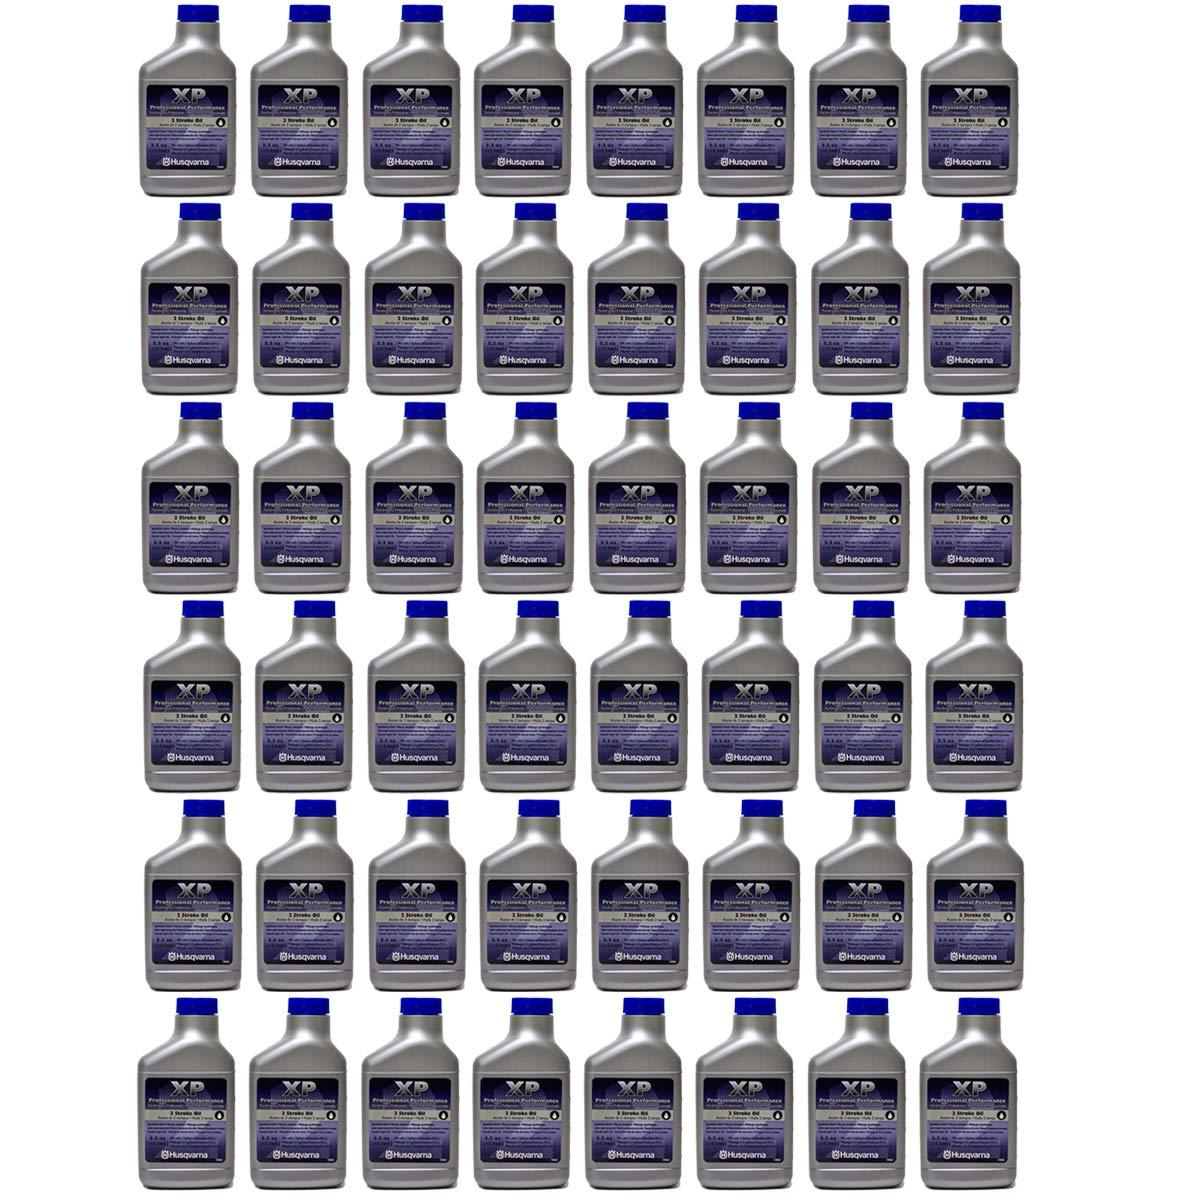 48PK Husqvarna 2 Cycle Stroke Engine XP Oil Synthetic Blend 2 Gallon Mix Case 5.2oz